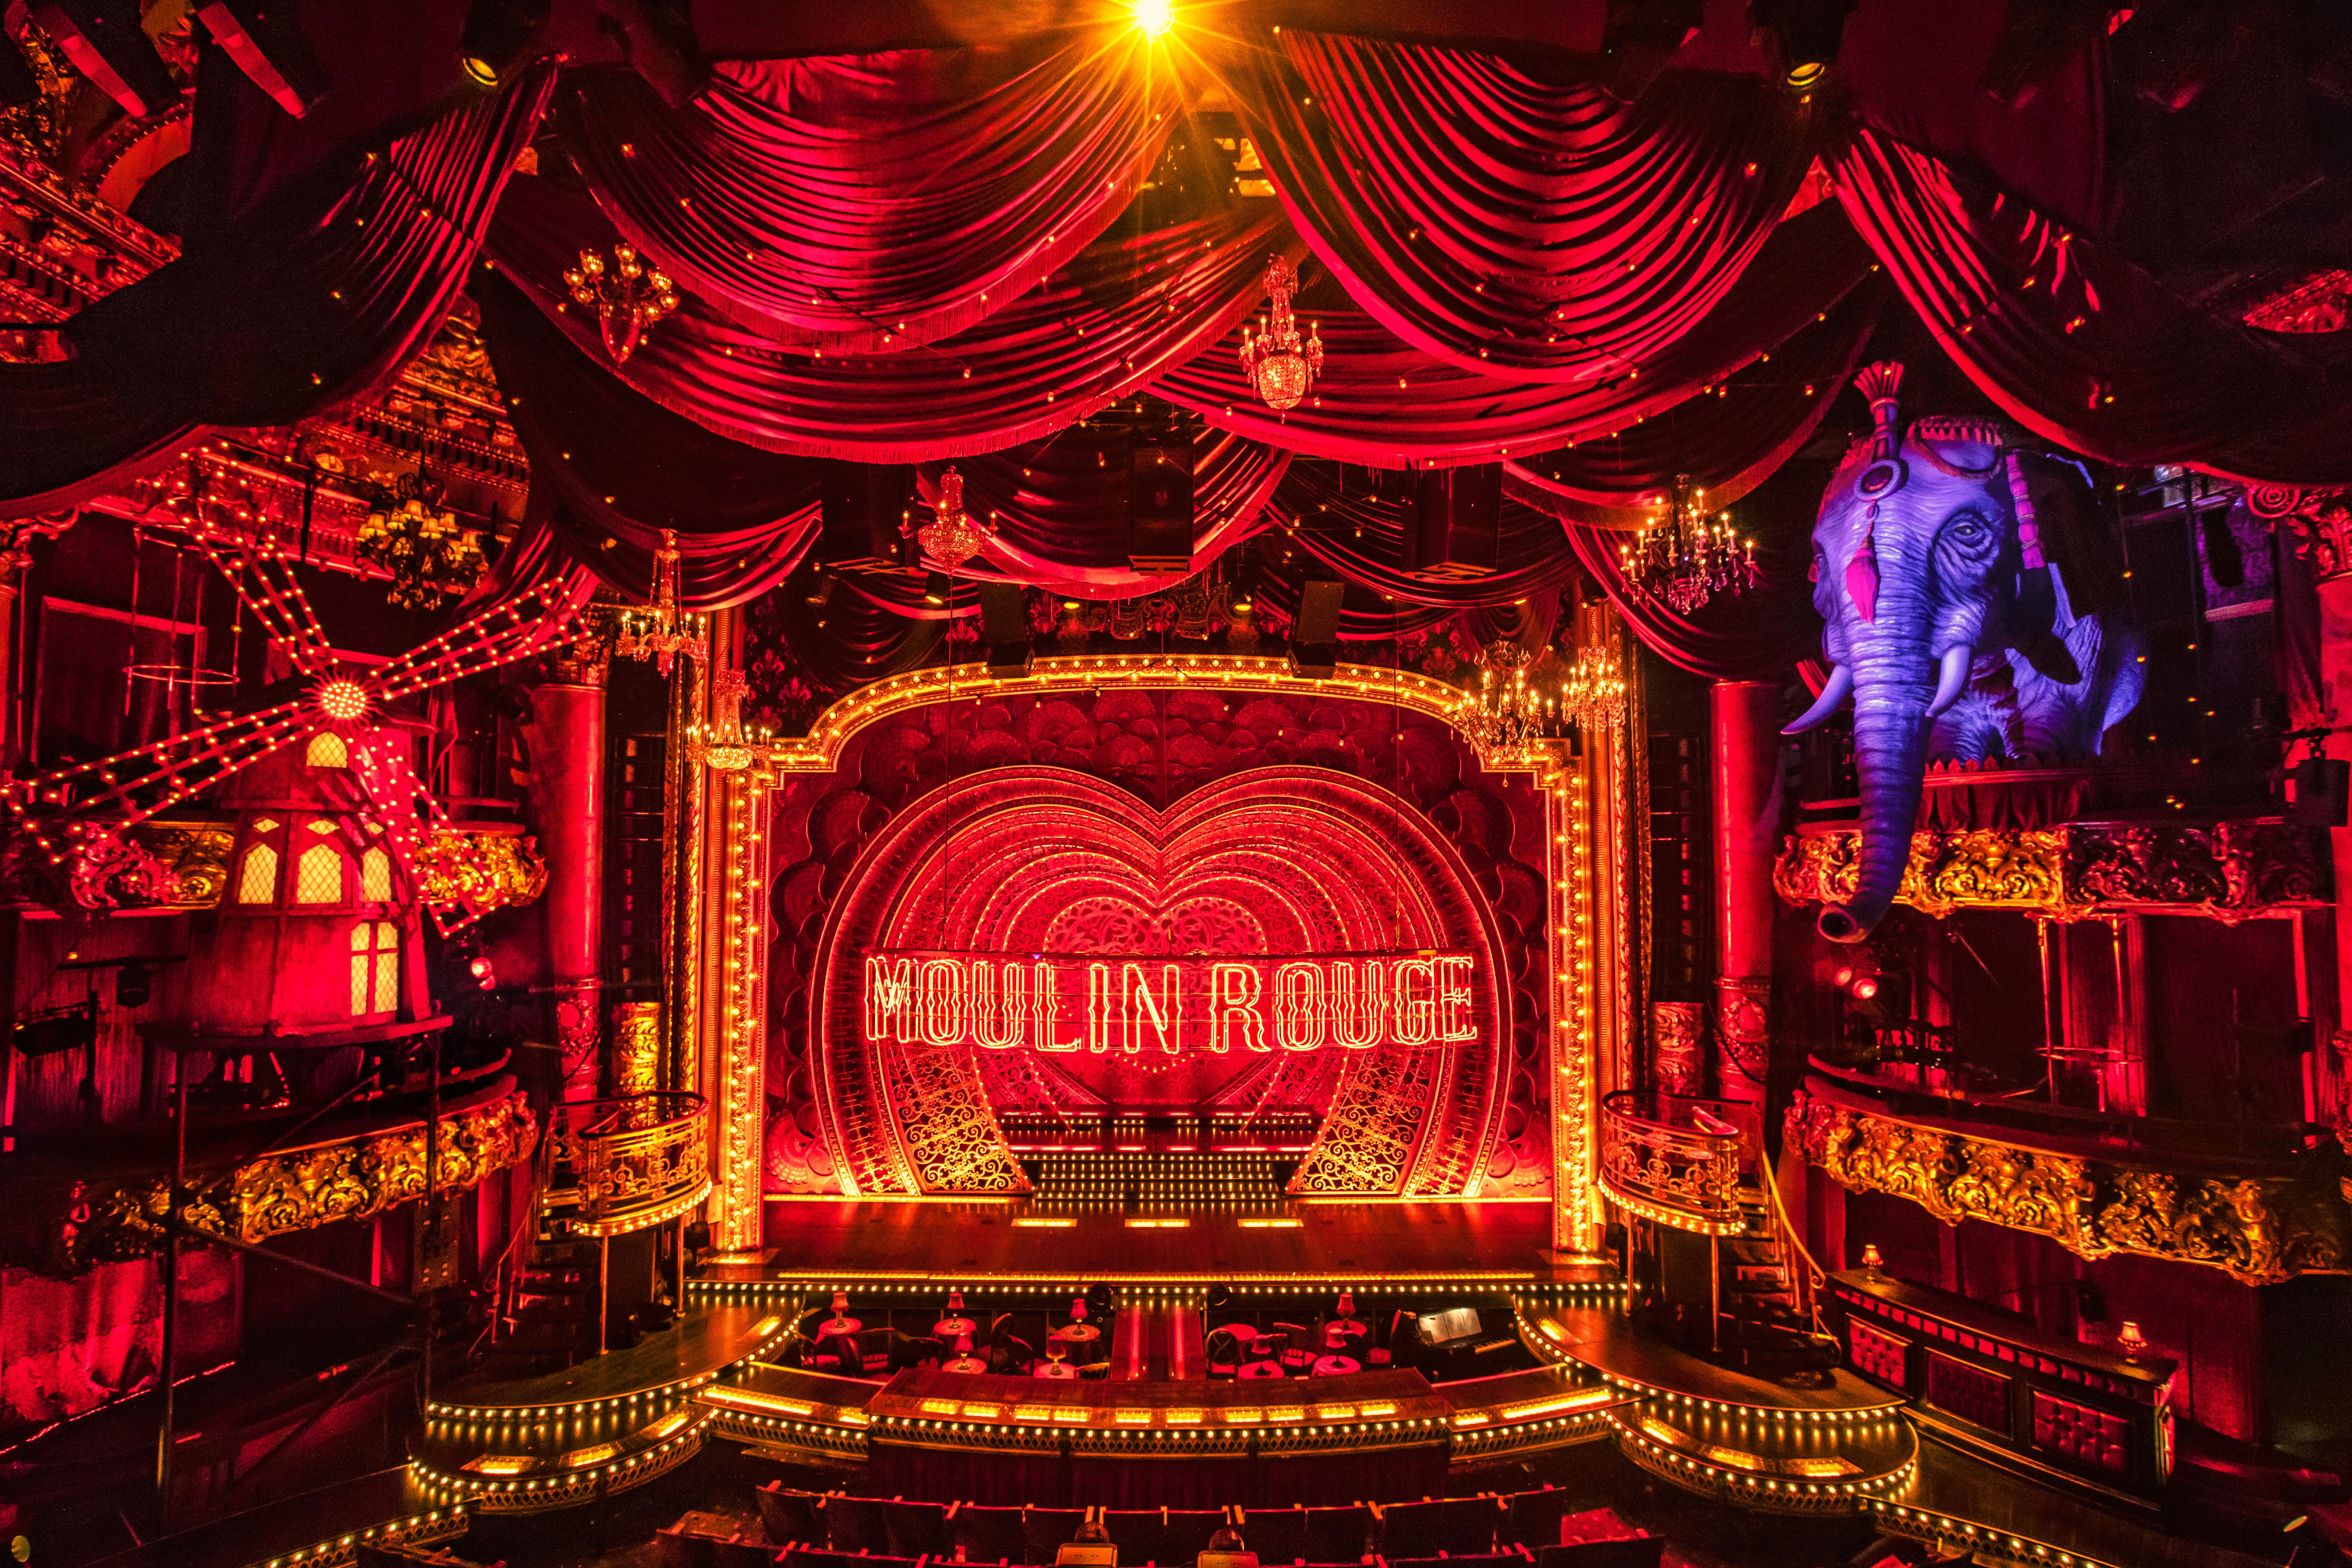 pas cher pour réduction 5bcd1 044f7 Moulin Rouge! Announces $29 Digital Lottery and Stage-Side ...